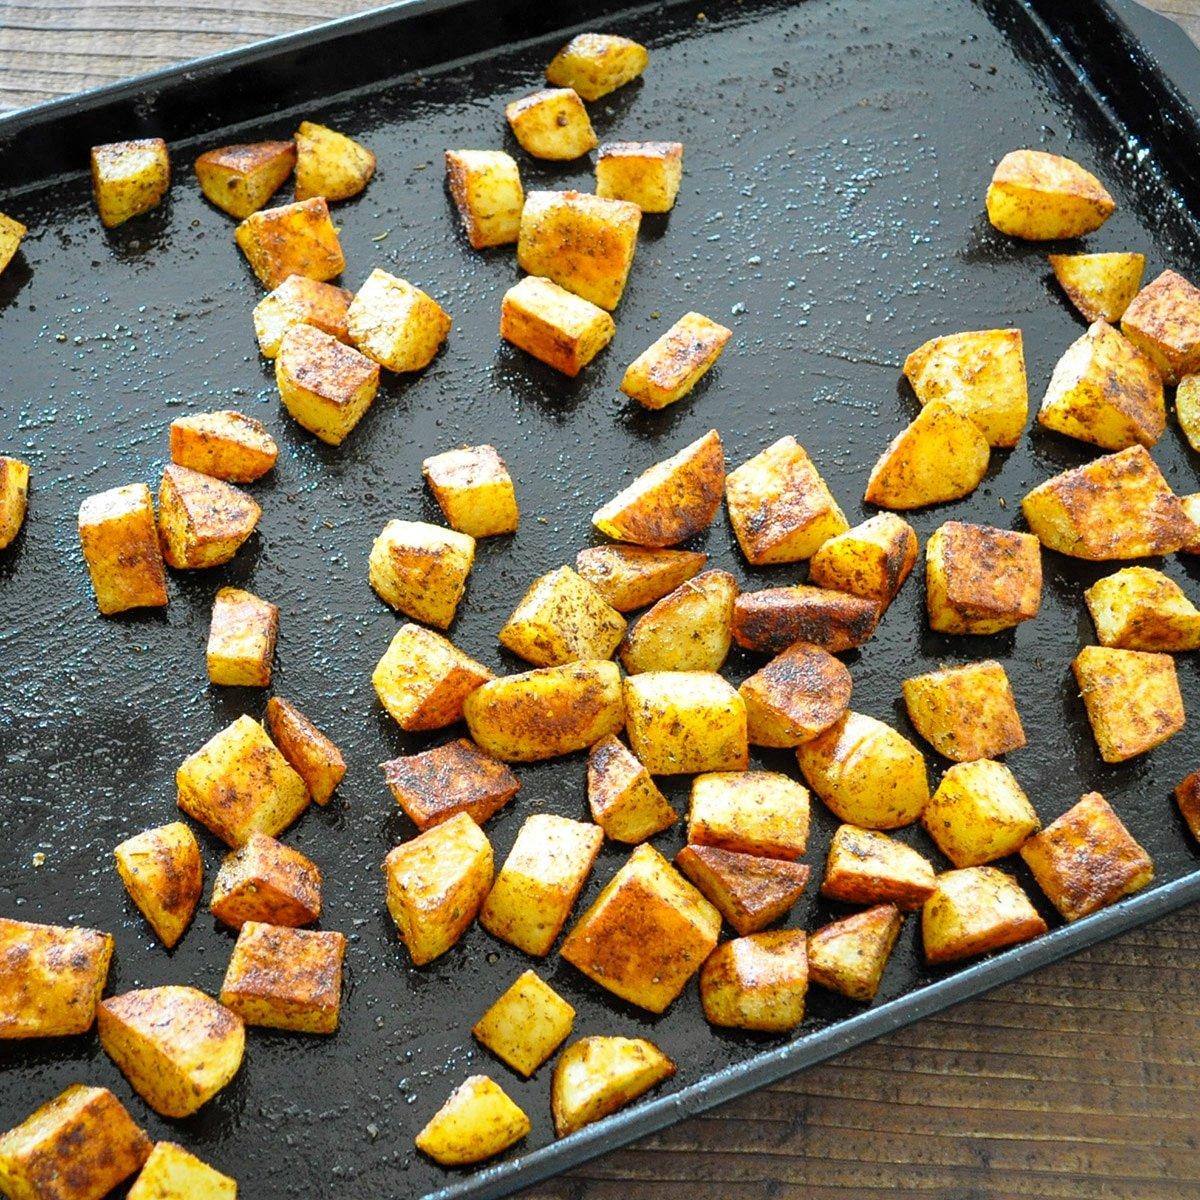 just baked seasoned roasted potatoes on a black baking sheet